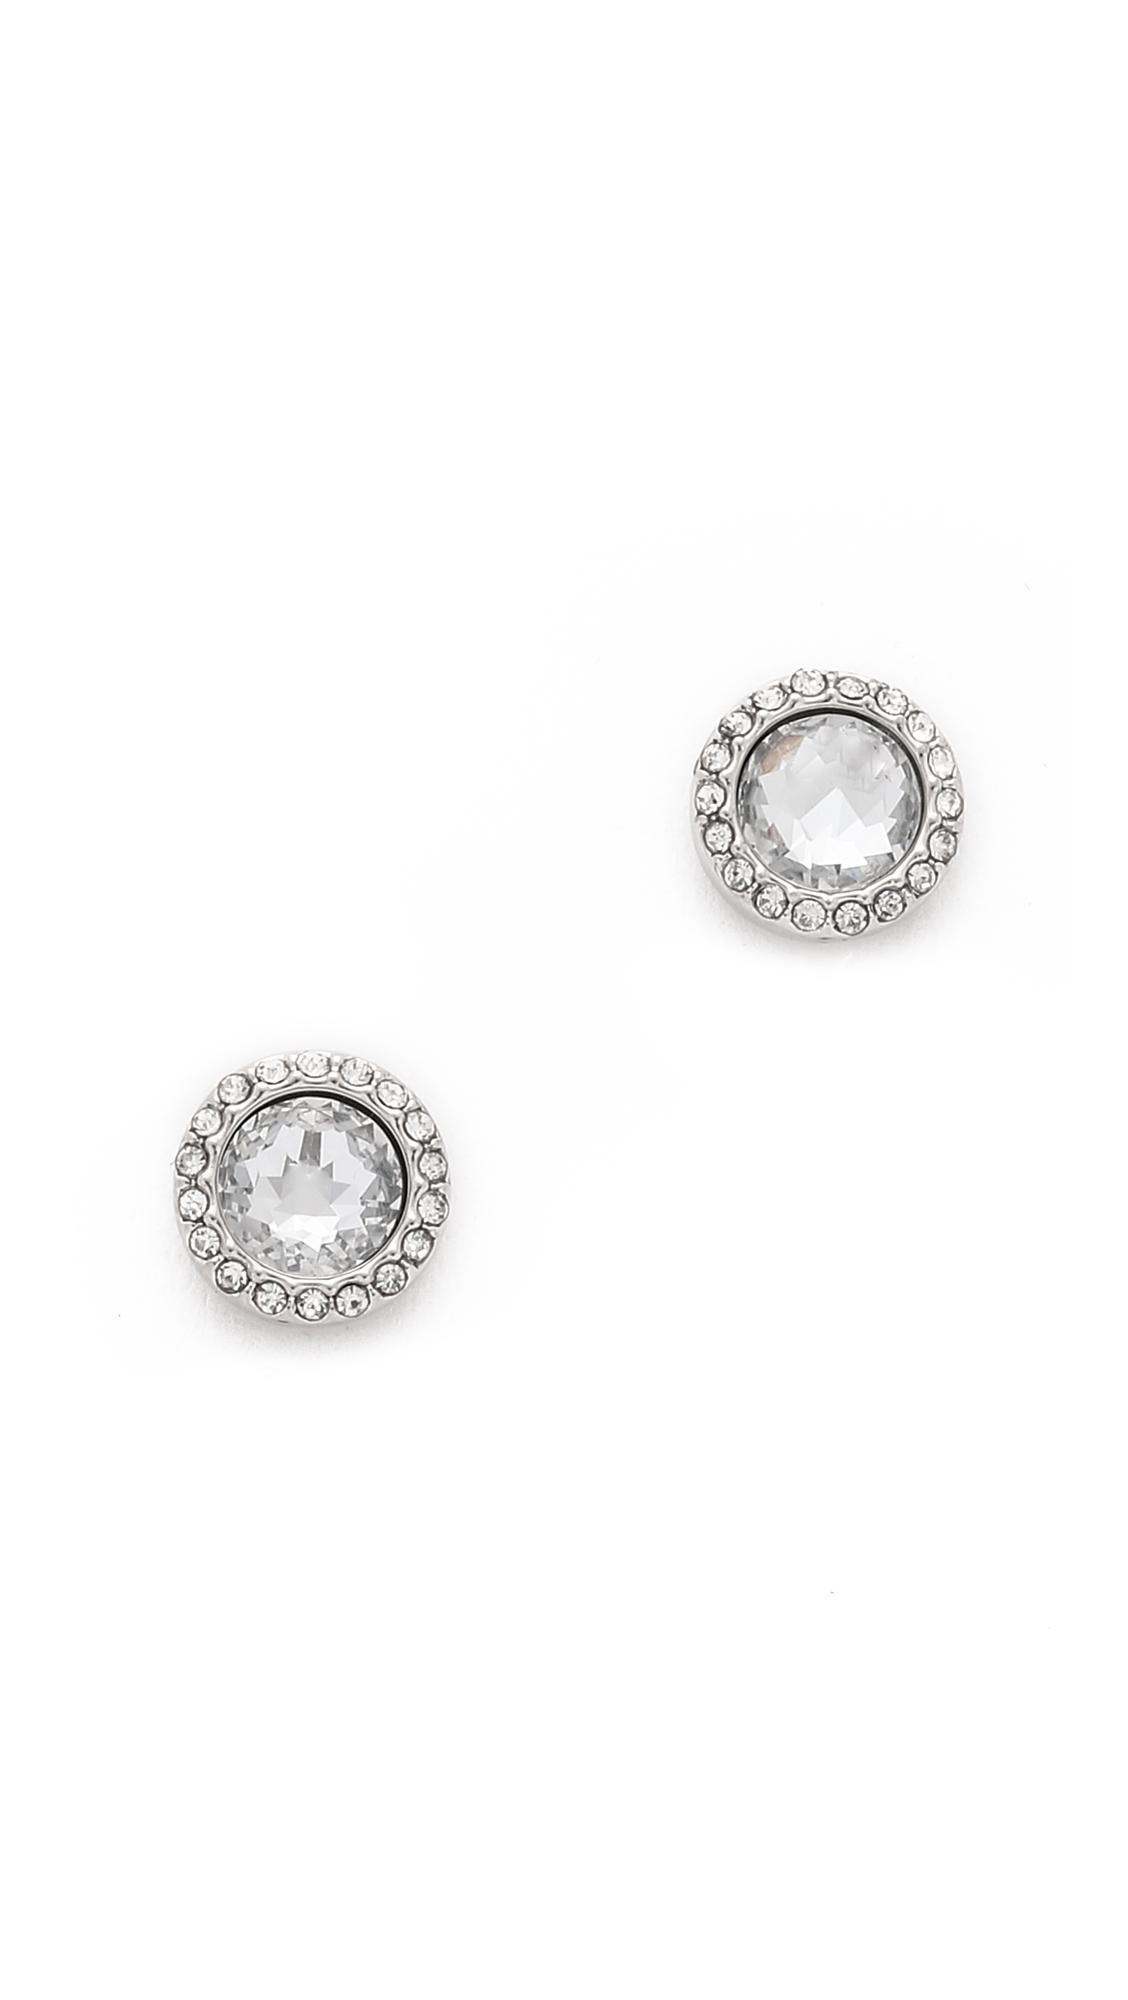 Rebecca Minkoff Crystal Halo Stud Earring in Metallic Silver ROnJCX